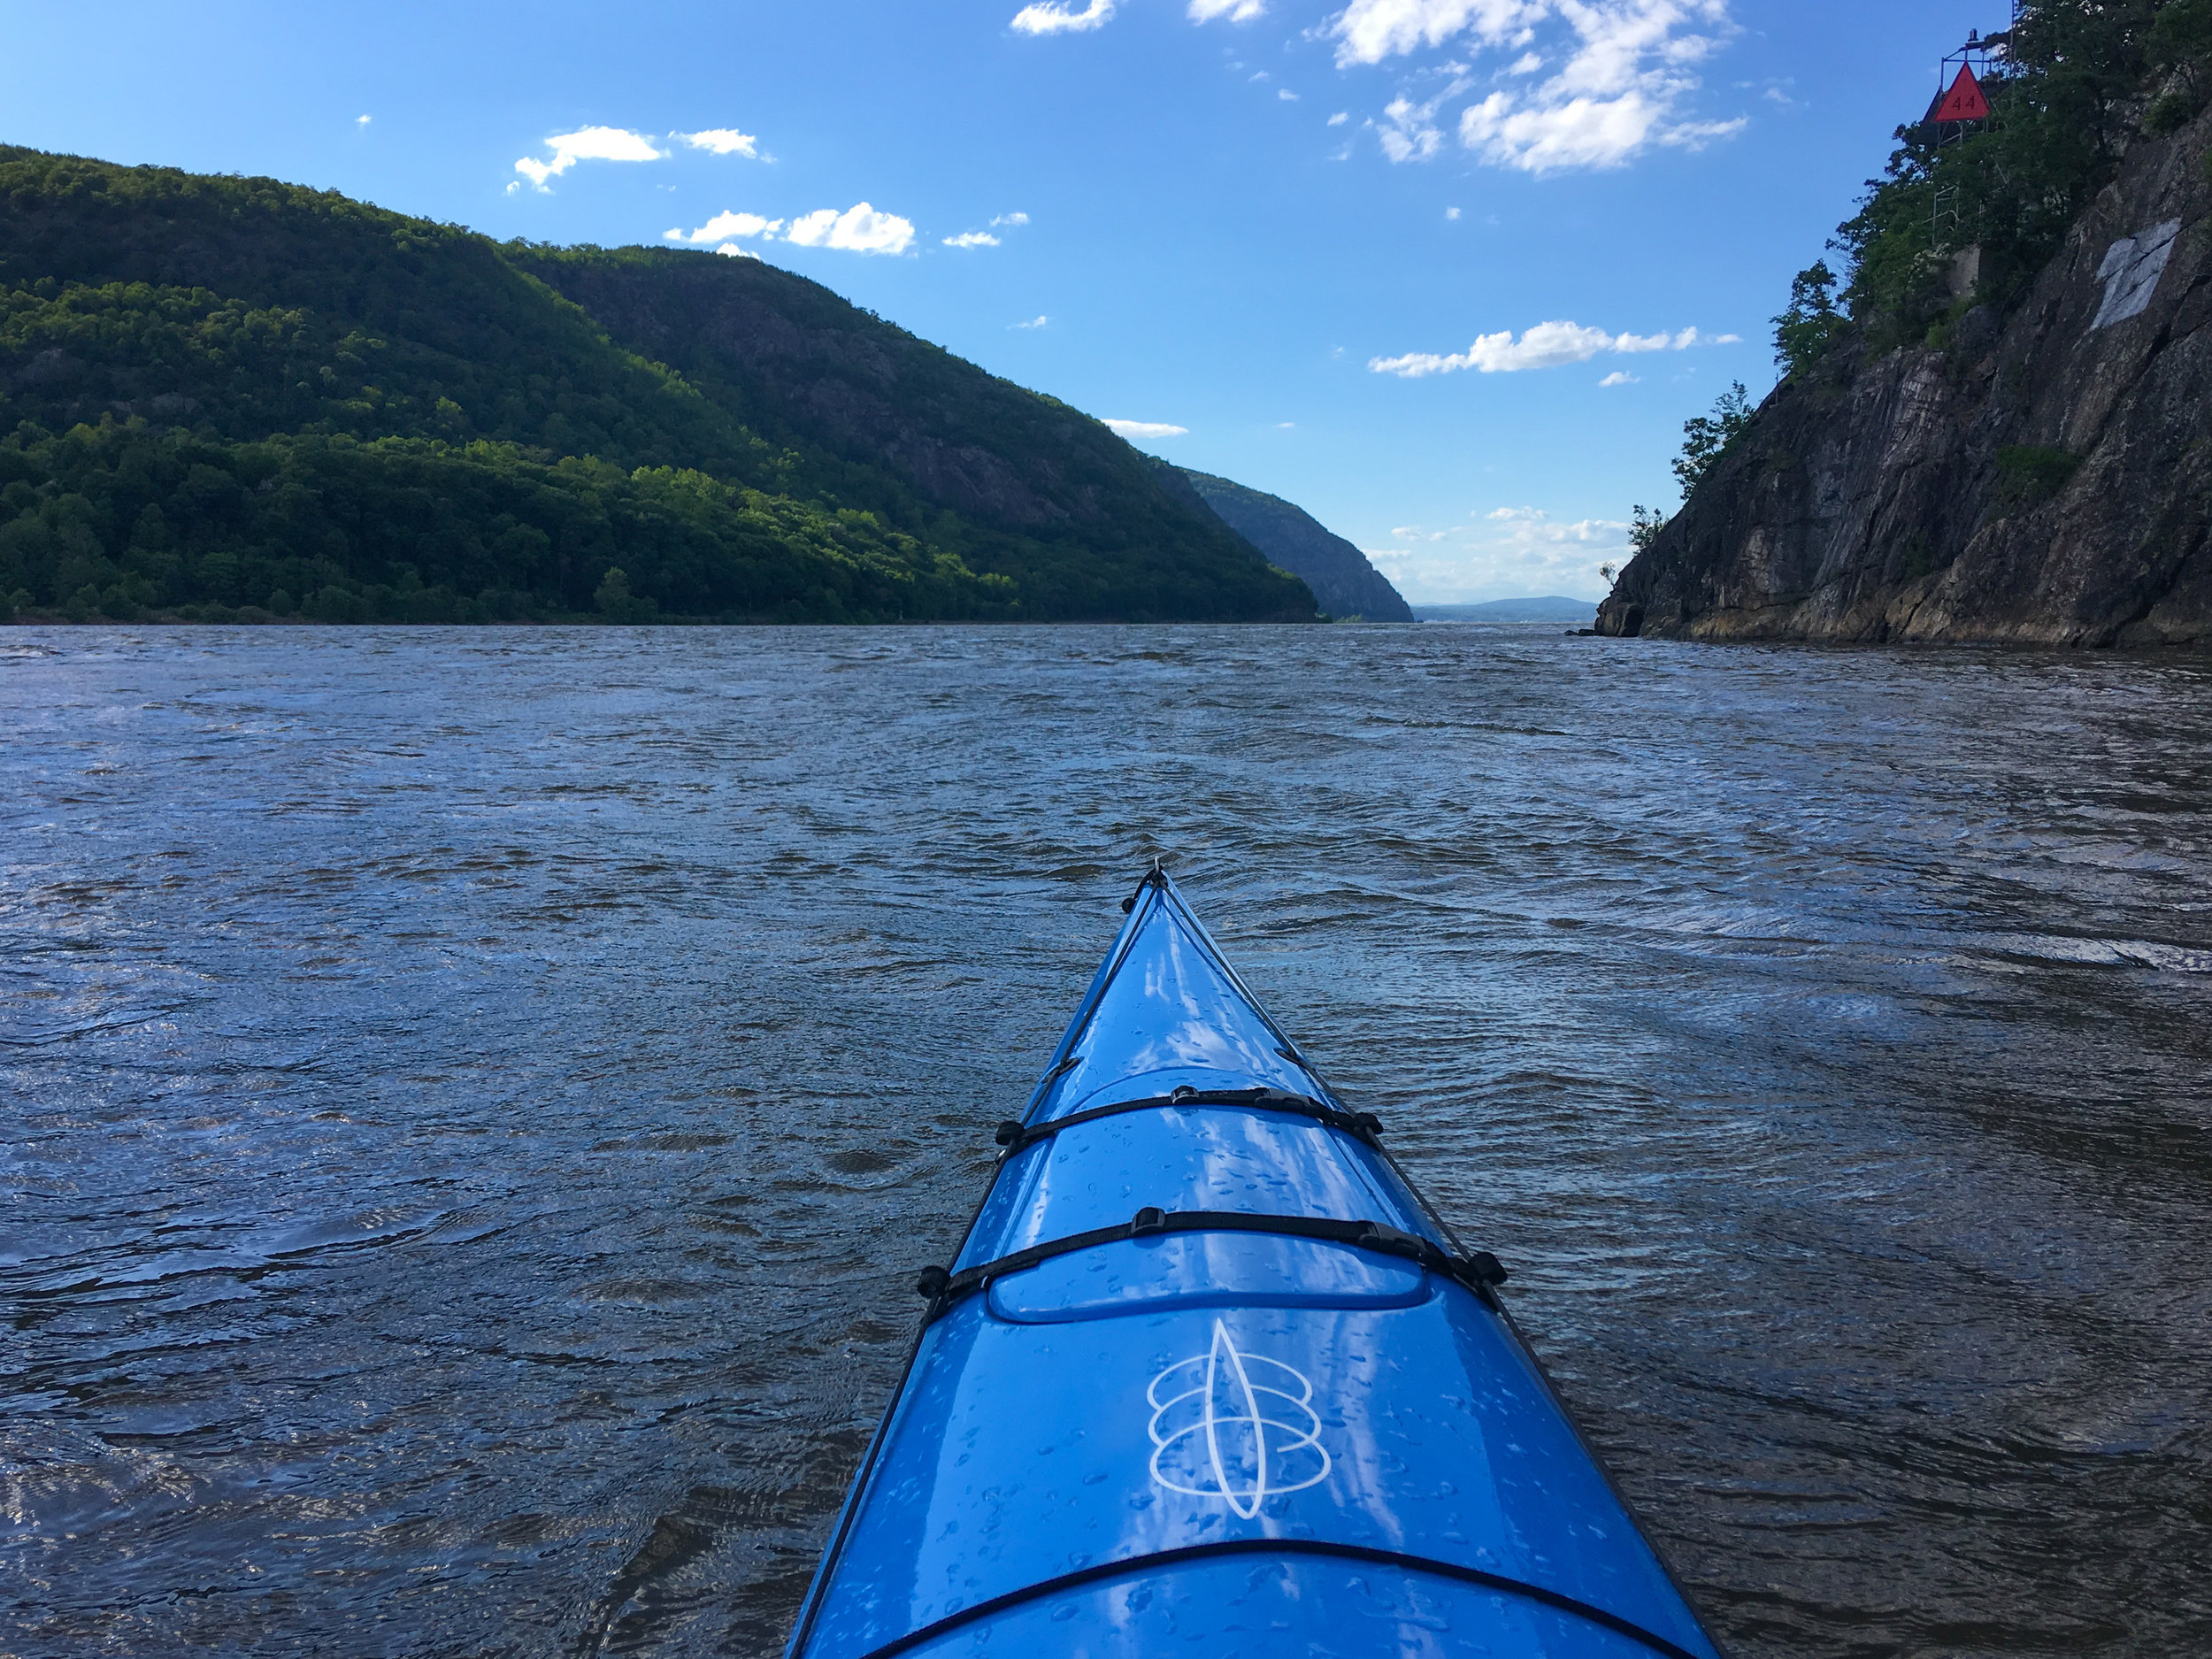 Hudson River on a Windy Day